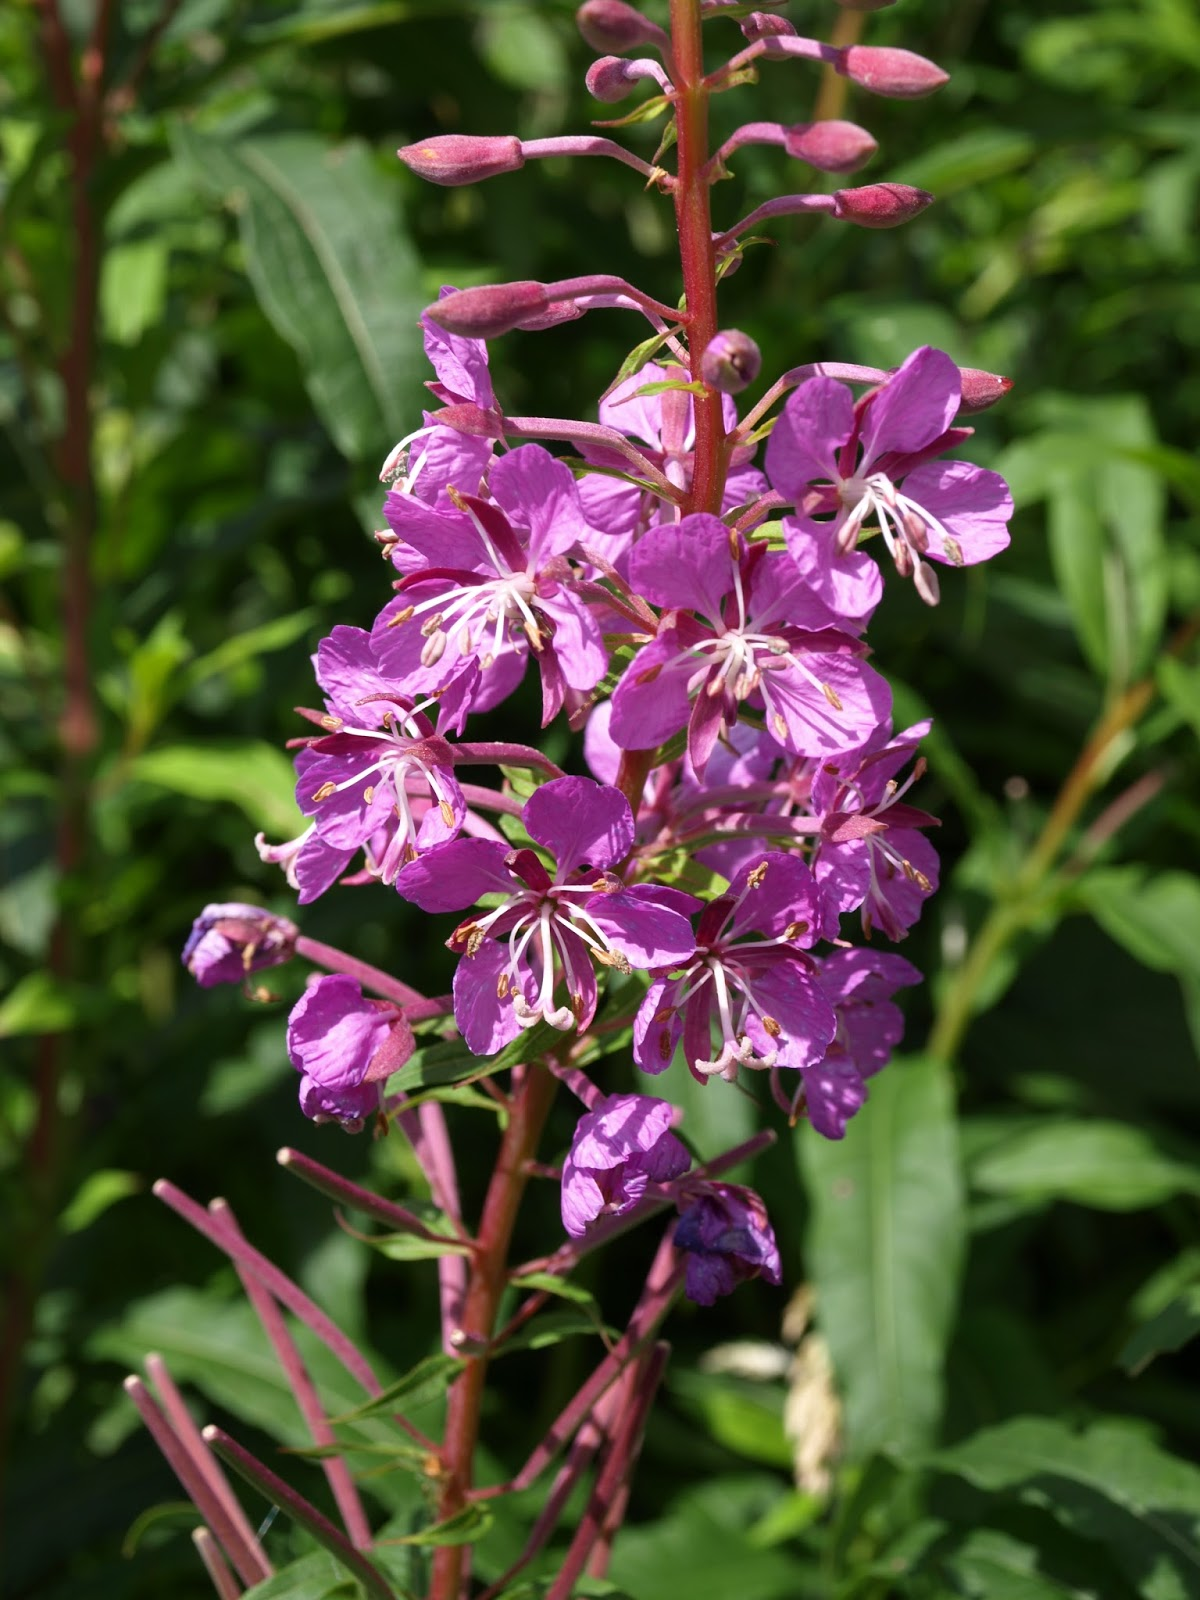 Raw Edible Plants Rosebay Willowherb Chamaenerion Angustifolium